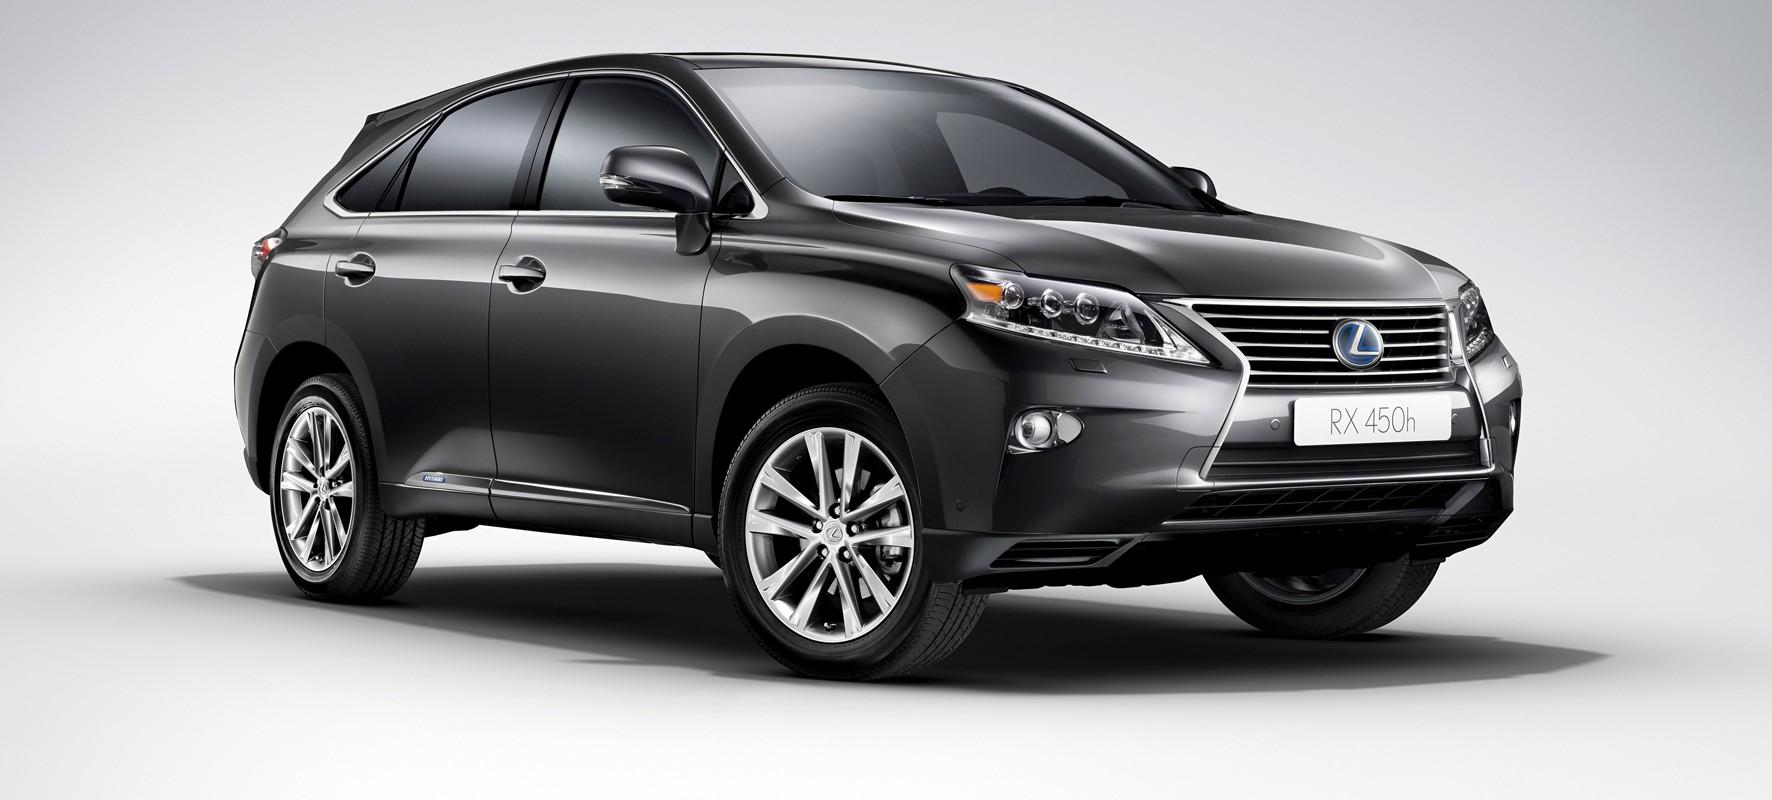 Lexus introduceert vernieuwde RX 450h Hybrid